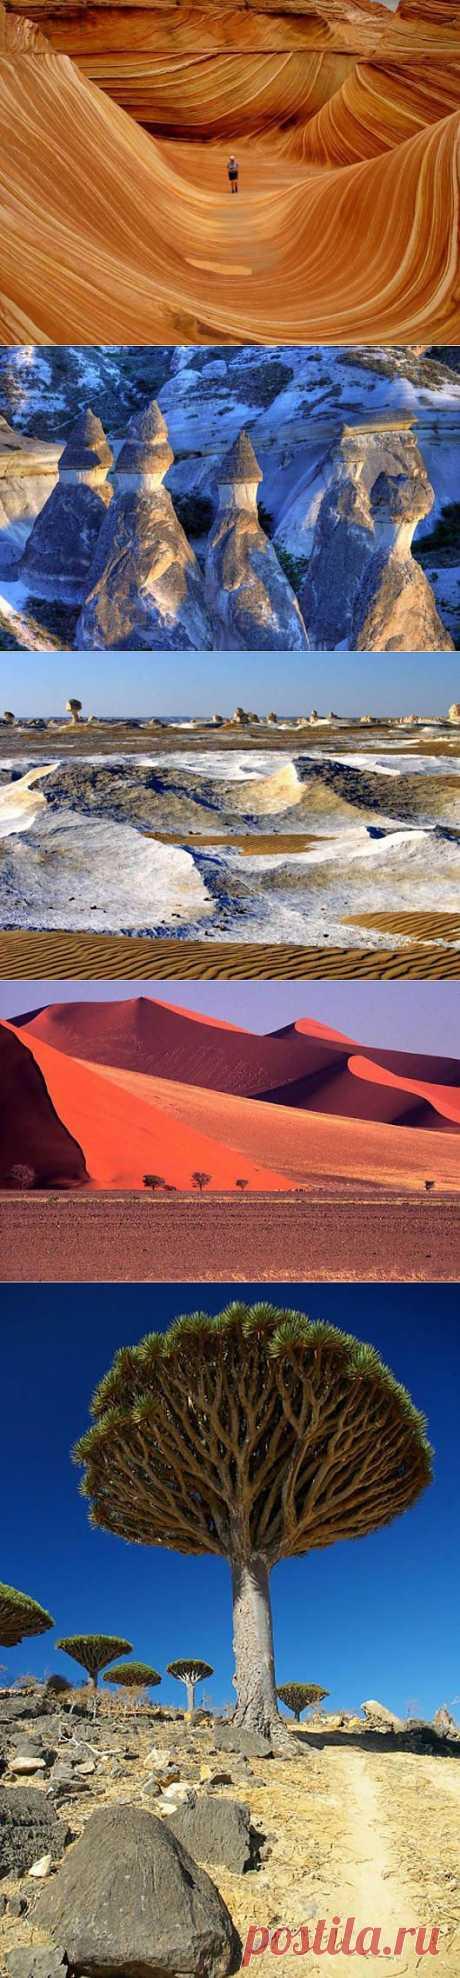 Неземные пейзажи планеты Земля (+Фото) -  www.ecology.md